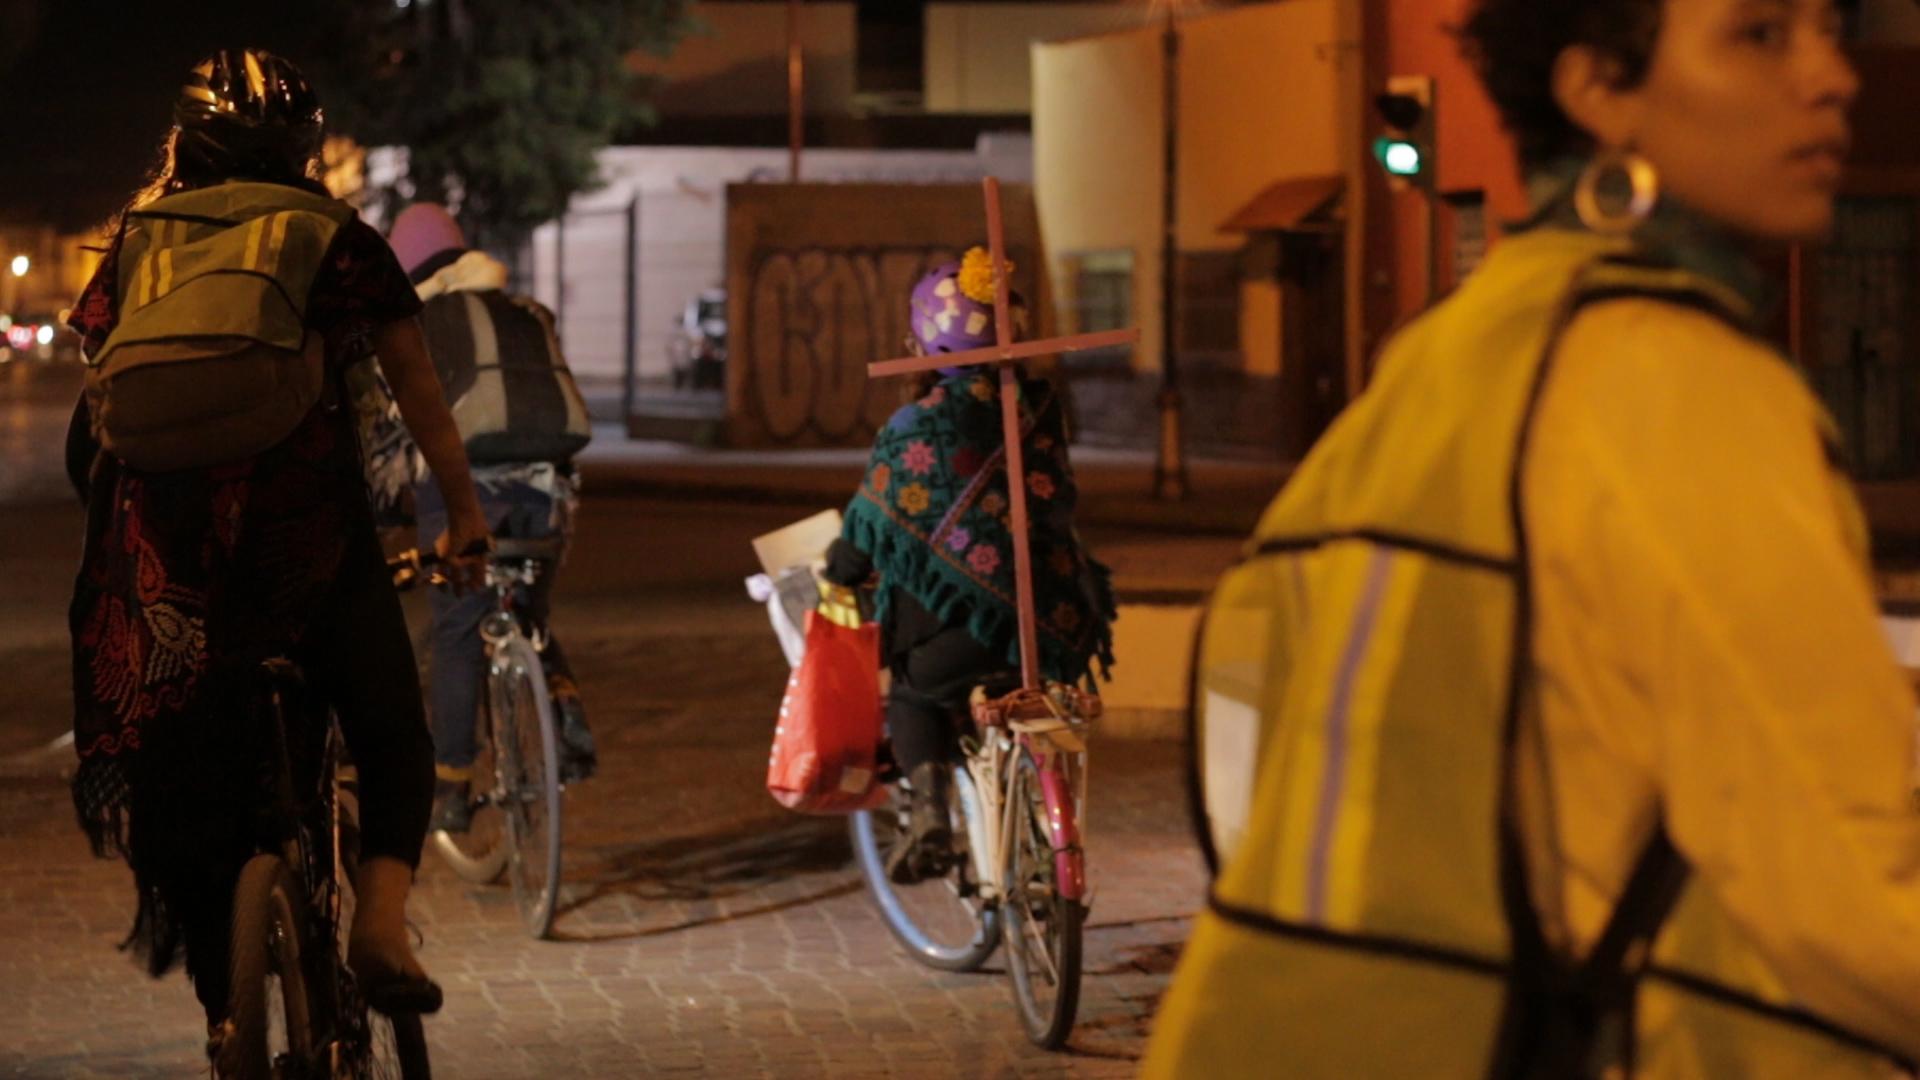 Mujeres ciclistas realizan rodada para honrar a víctimas de feminicidios